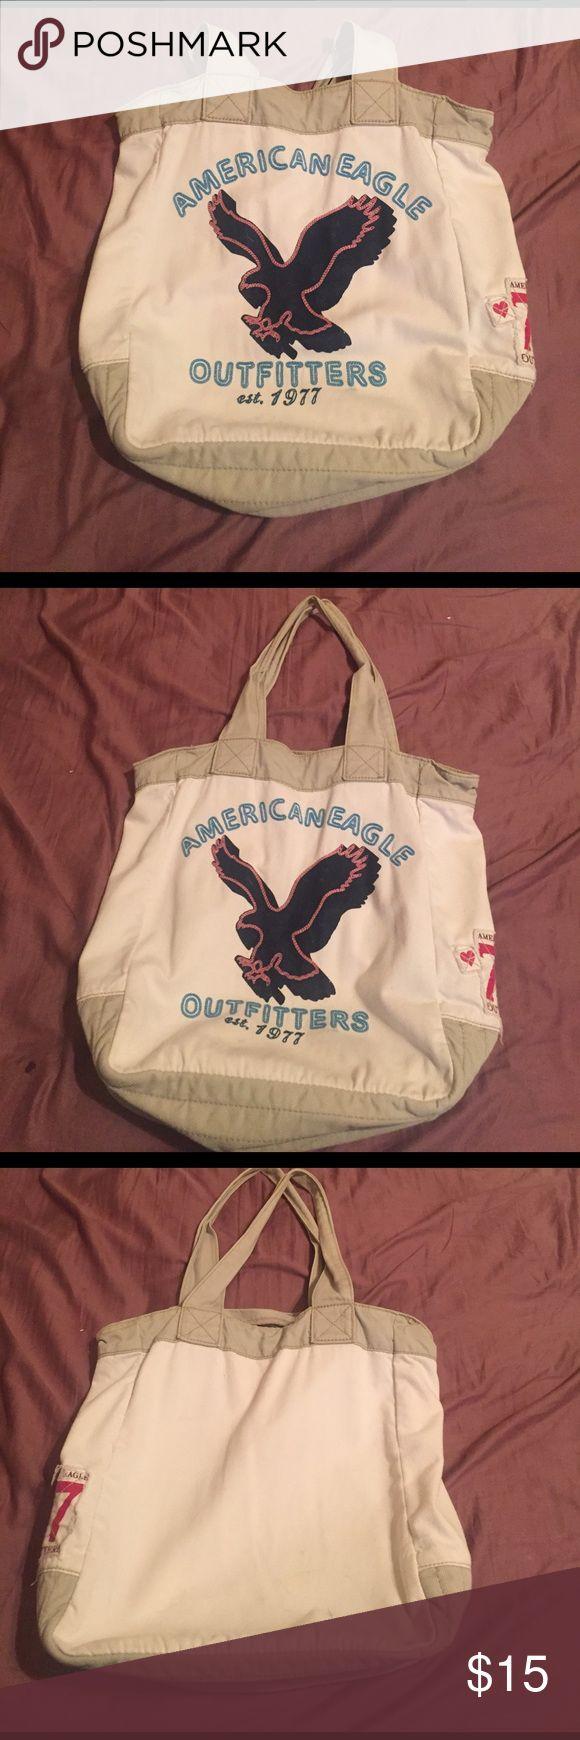 American Eagle Tote Bag American Eagle Tote Bag American Eagle Outfitters Bags Totes